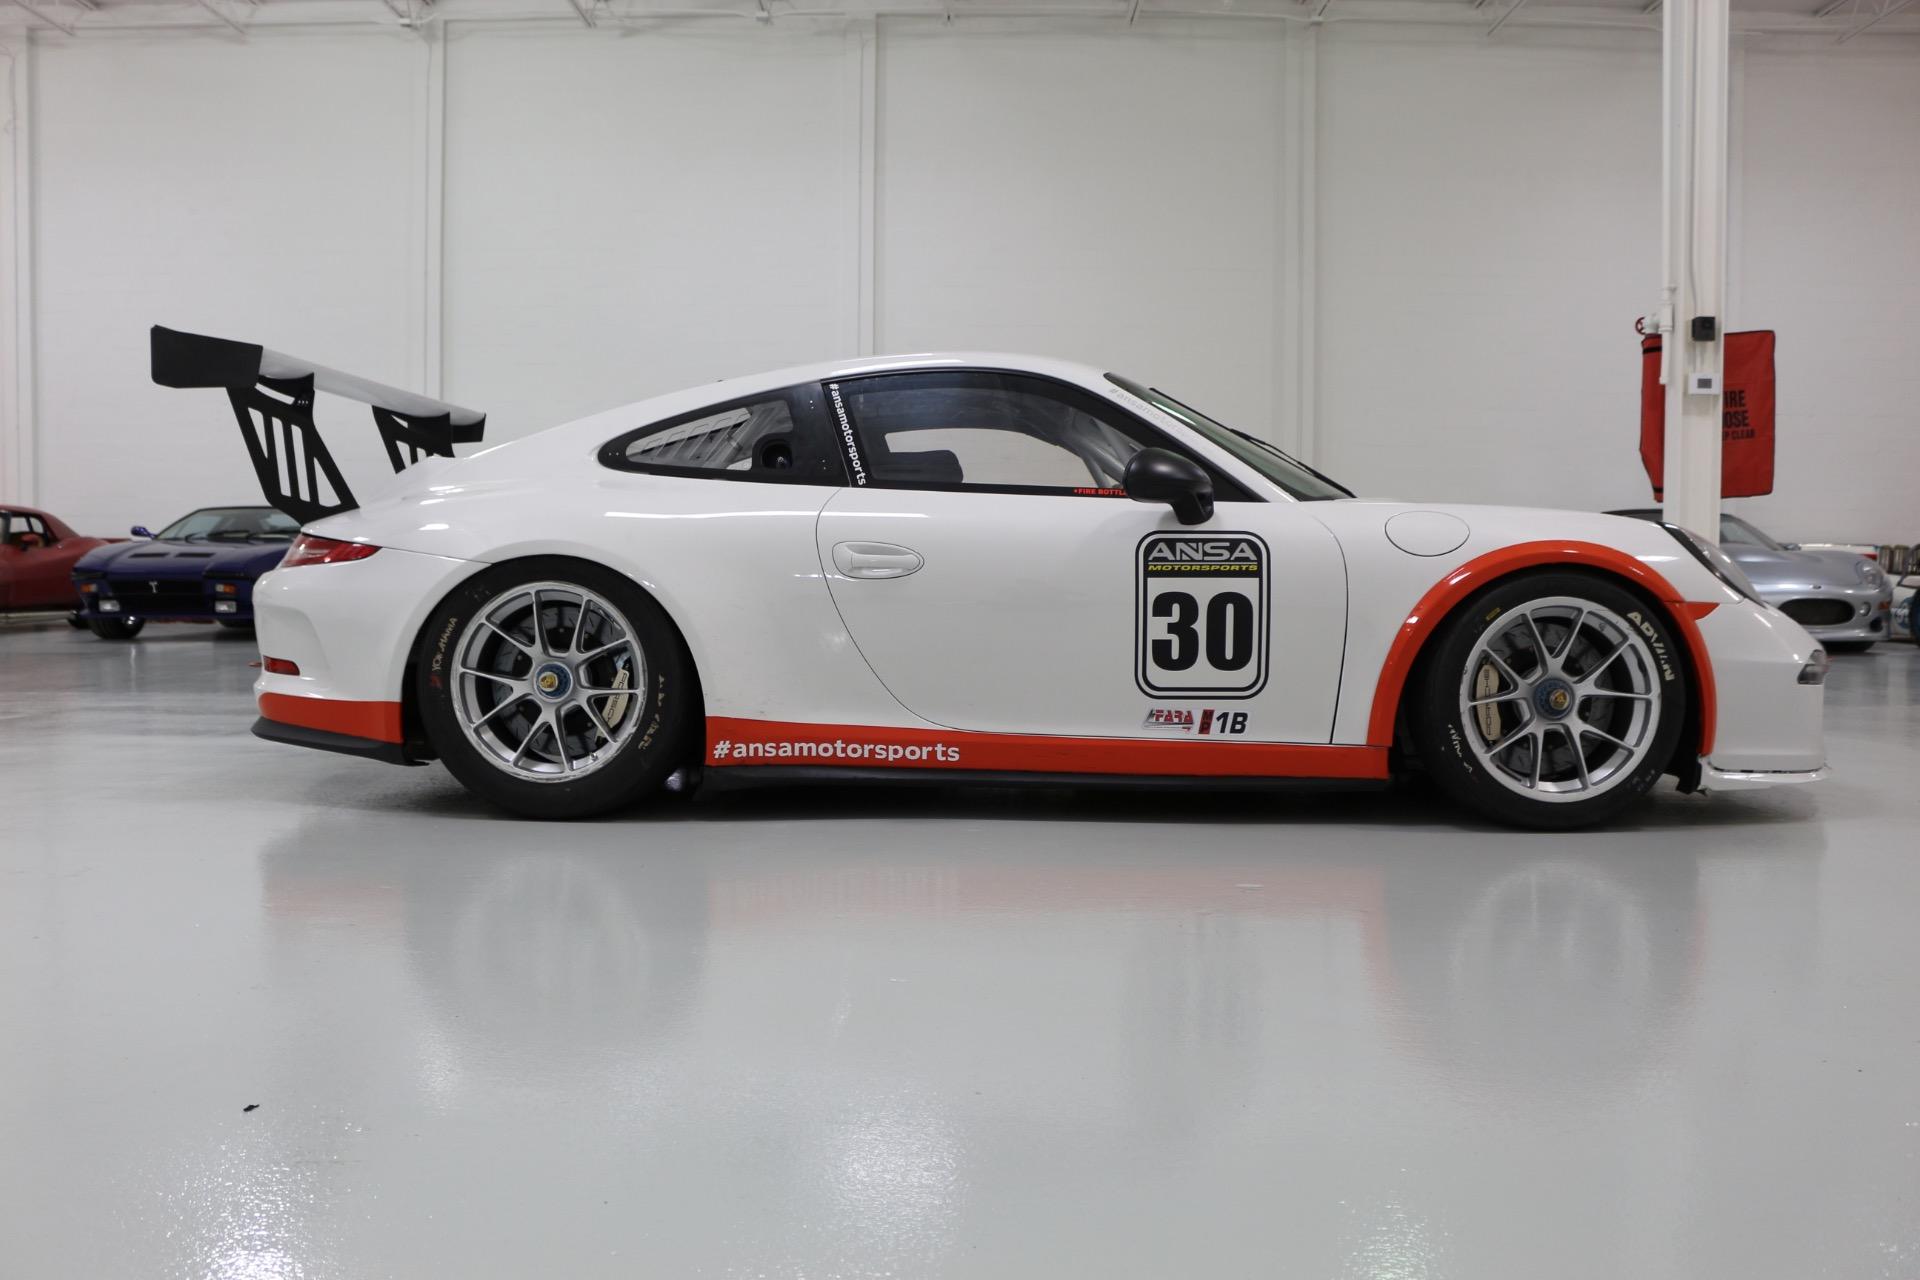 2015 porsche 911 cup car for sale in miami fl 198146 all sports motor network. Black Bedroom Furniture Sets. Home Design Ideas